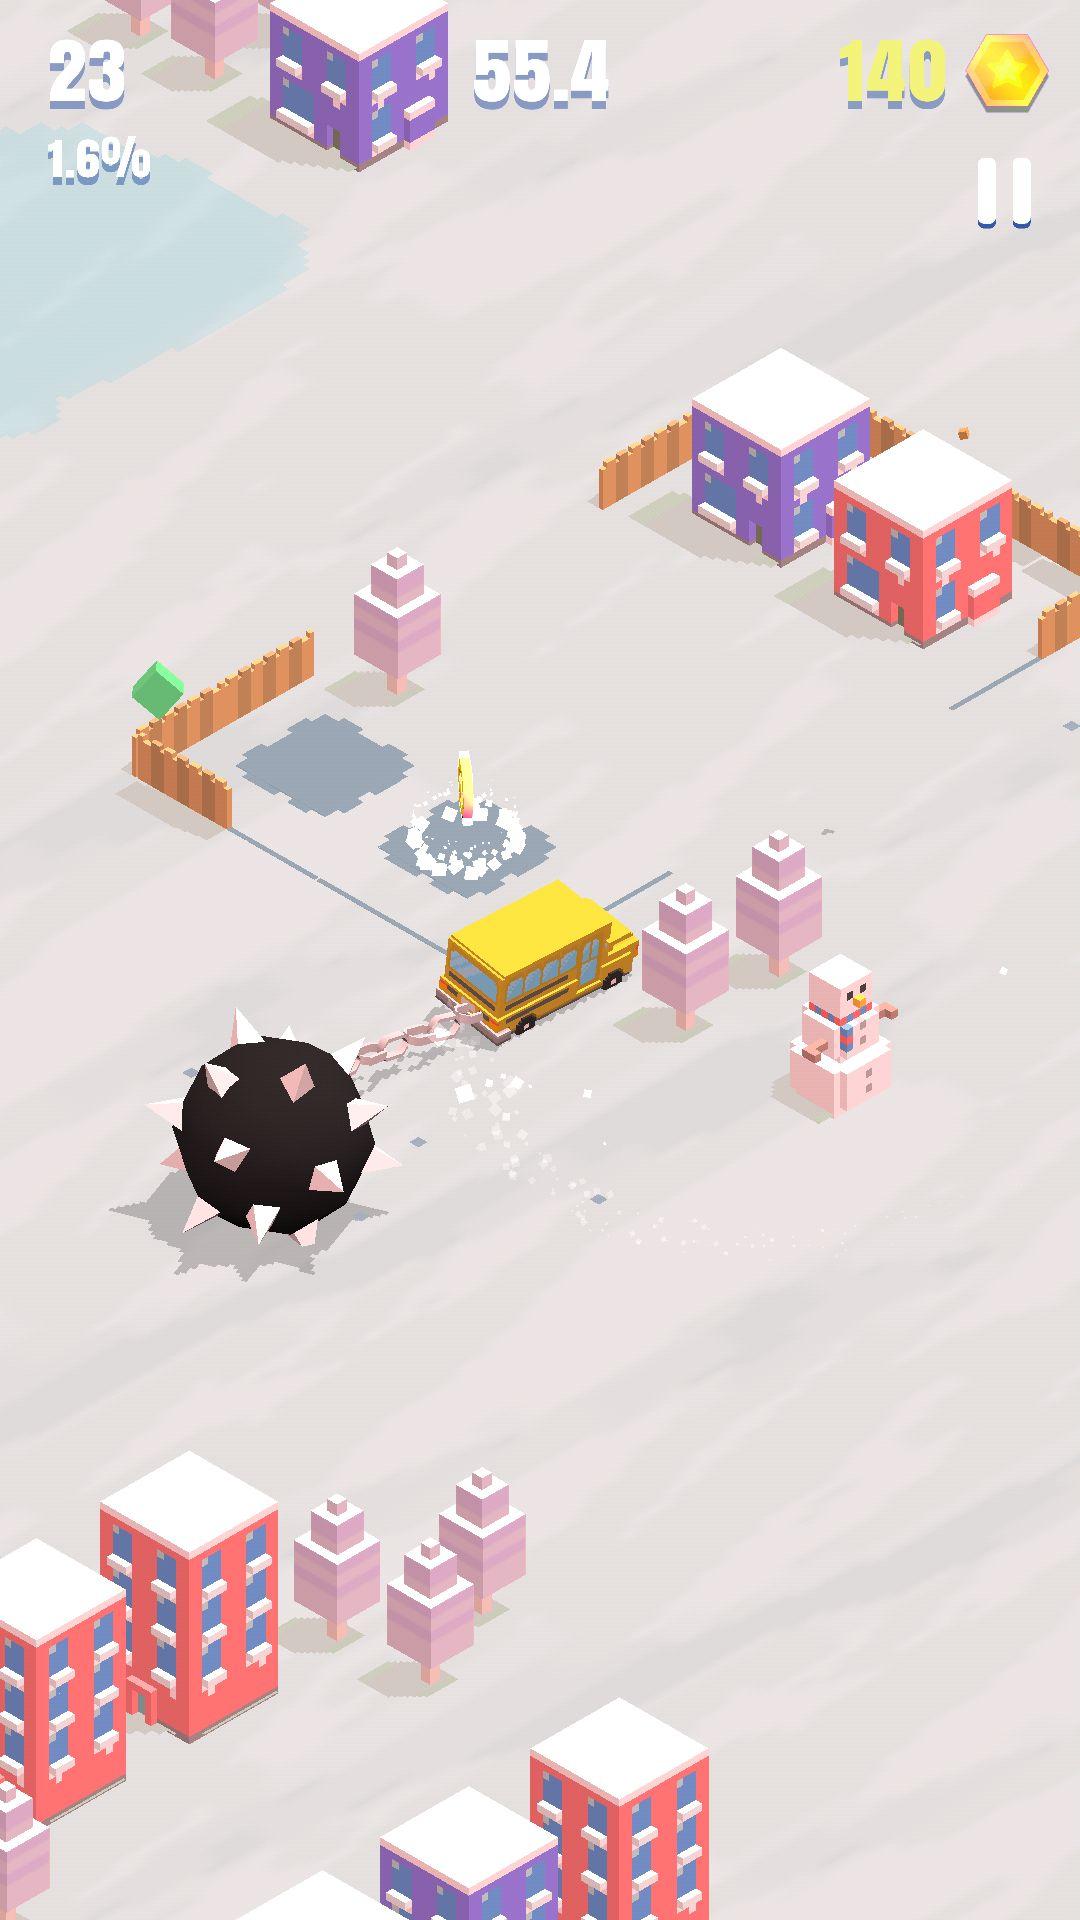 androidアプリ フレイルライダー(Flail Rider)攻略スクリーンショット4